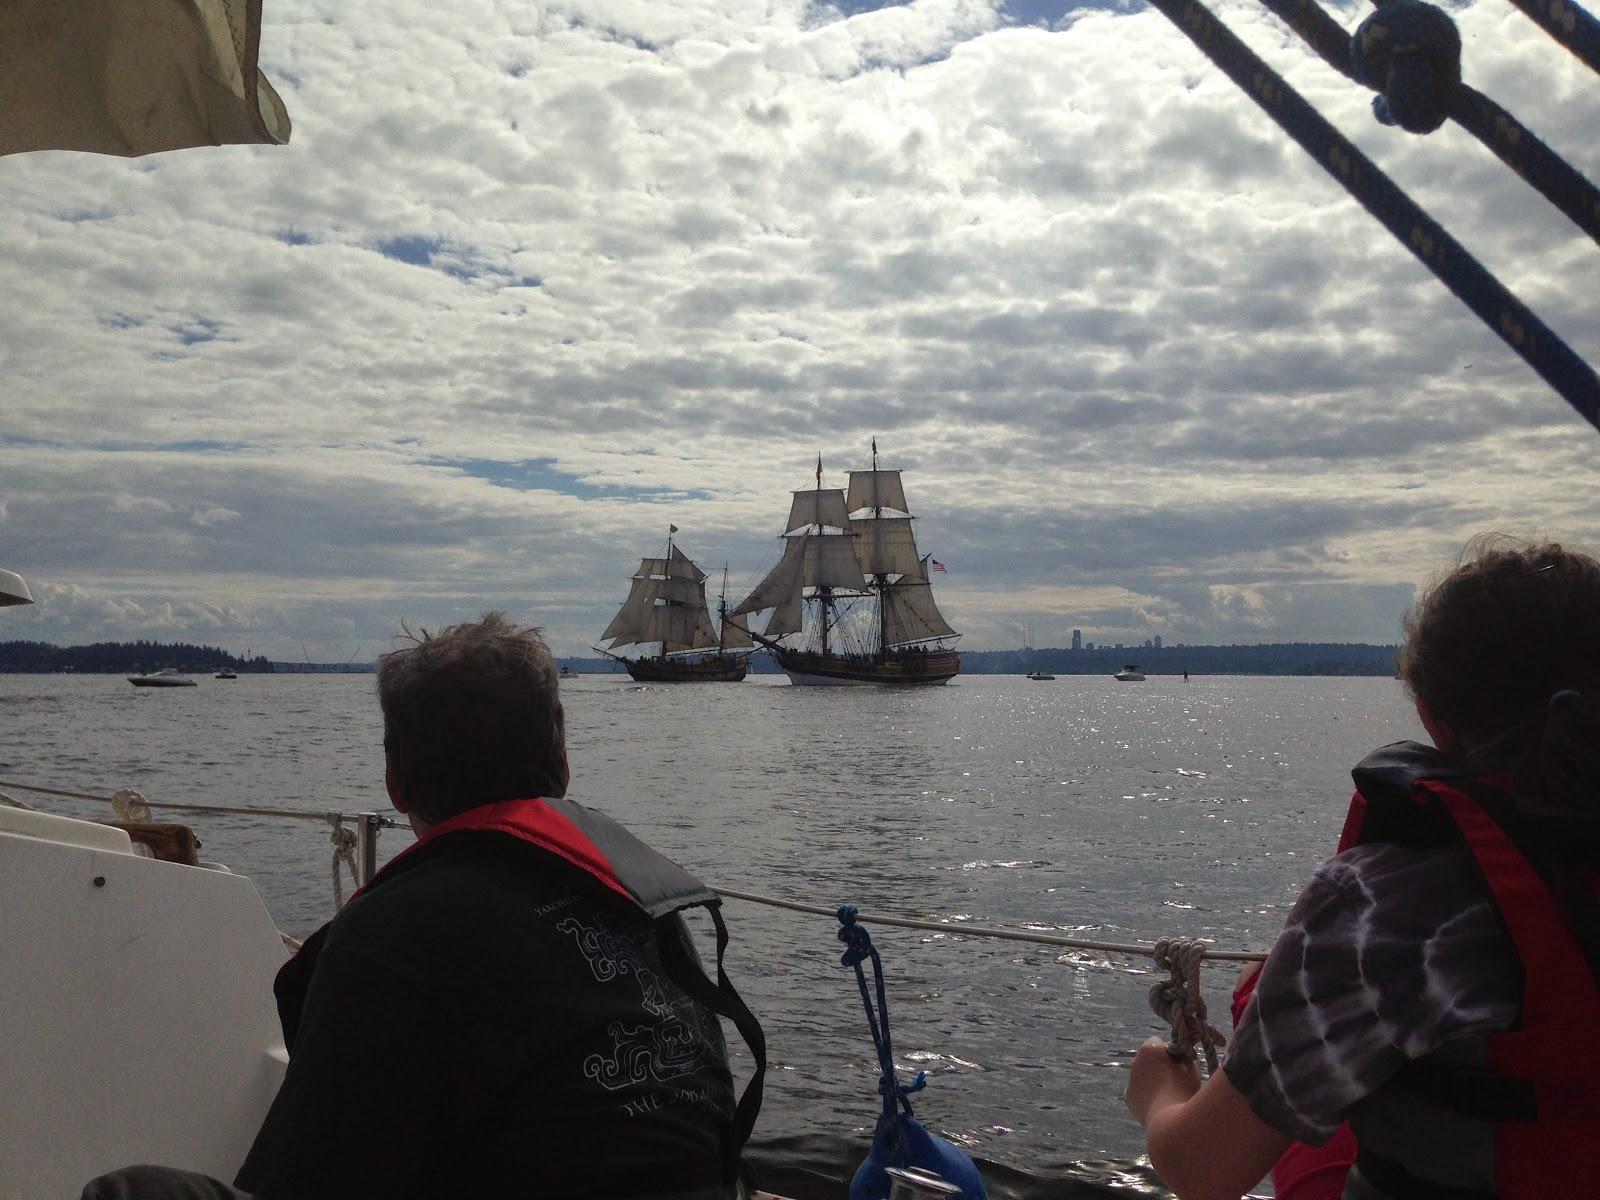 The Catalina 22 Yacht's Log: Intercepting the Lady Washington